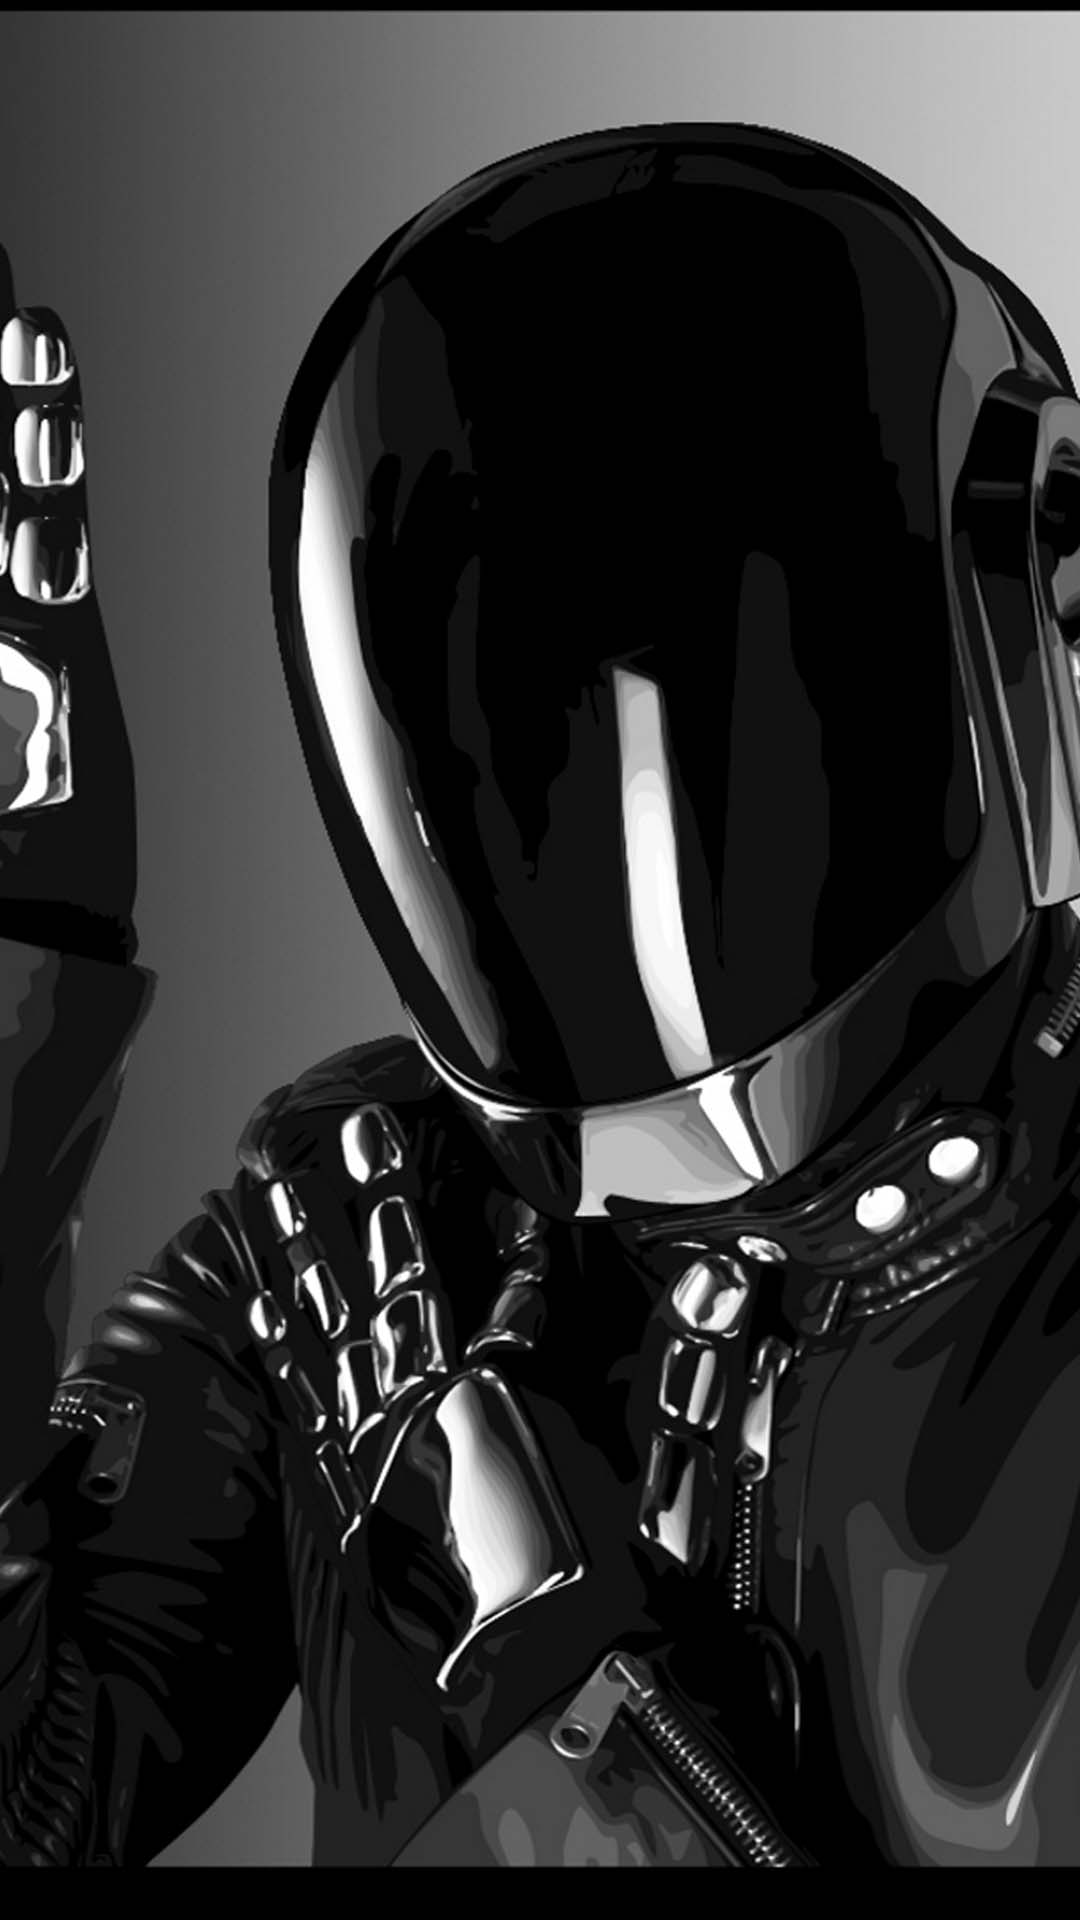 Daft Punk Shiny Helmet